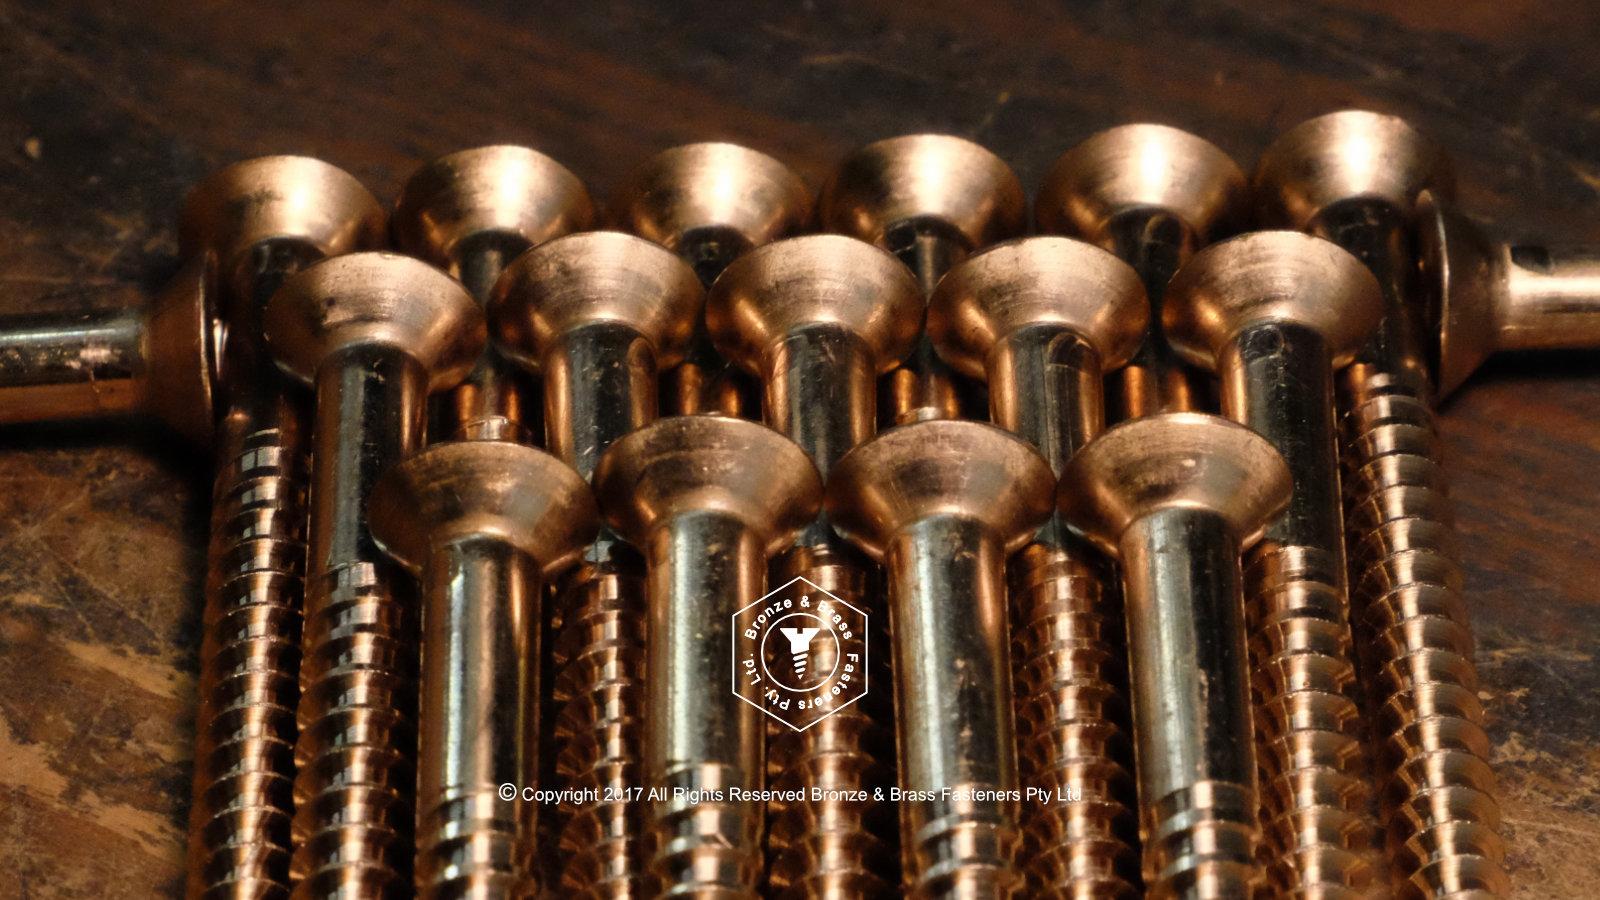 Silicon bronze Flat Head Wood Screws - Cut Thread - Square Drive